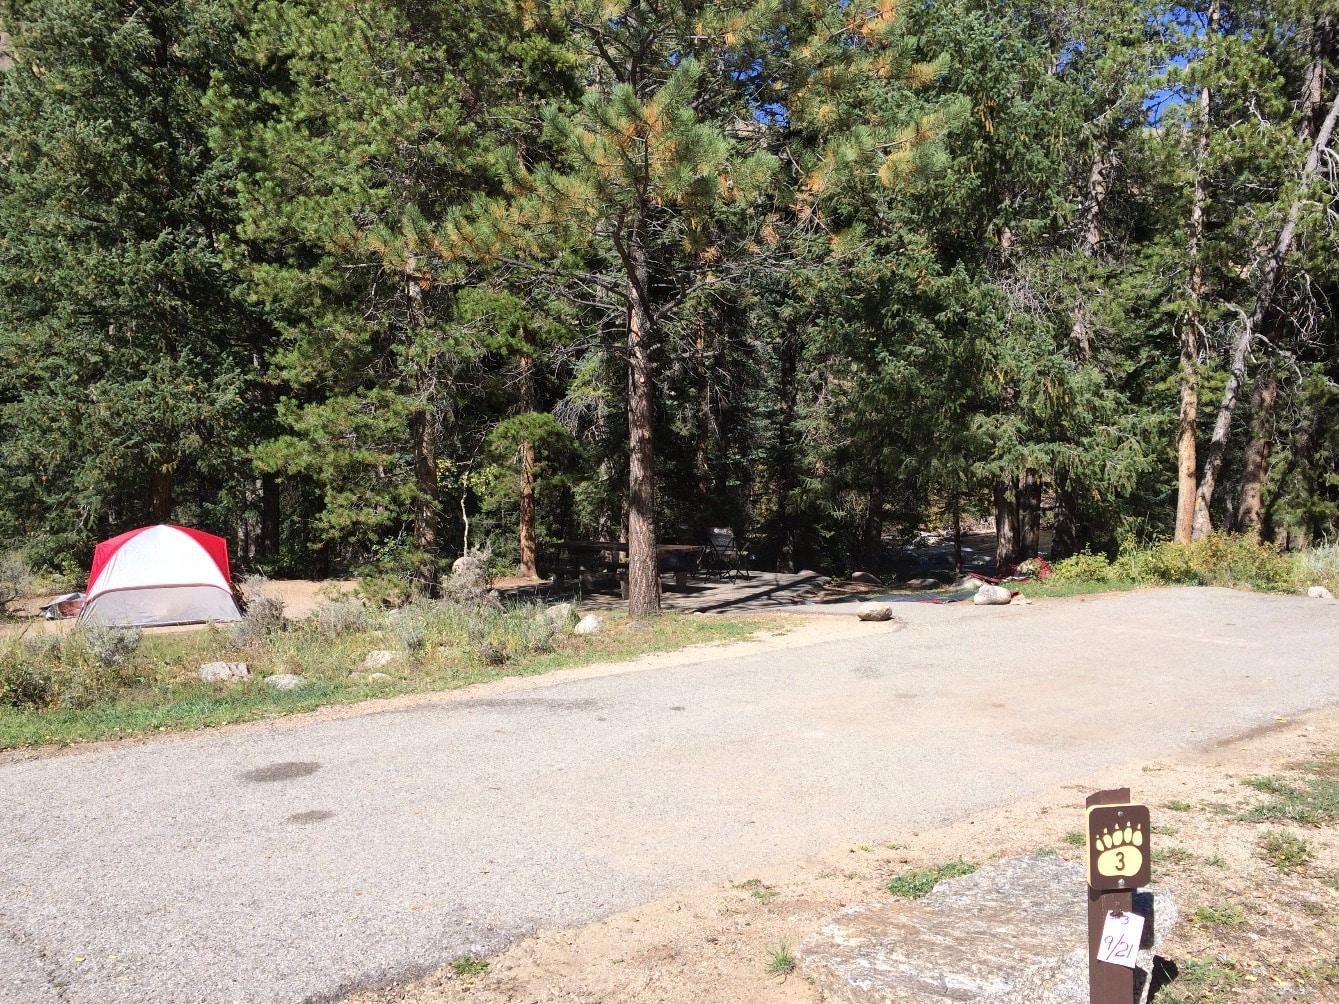 Campsite #3 - Rosy Lane Campground